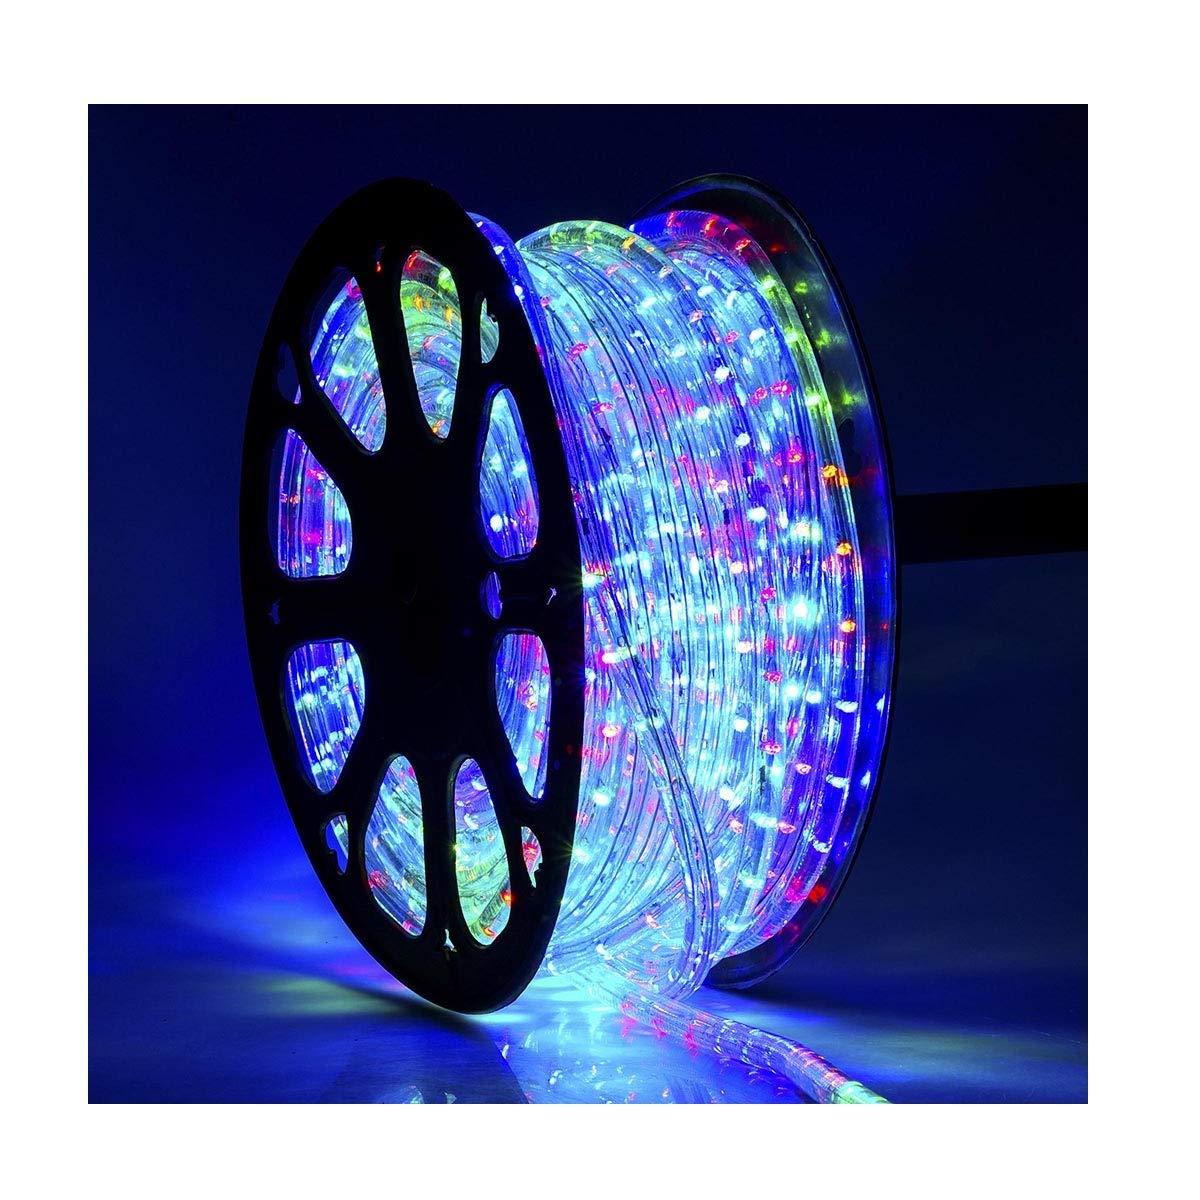 Buy Mufasa Waterproof PVC LED Strip Light Roll, 20 m, Multicolour